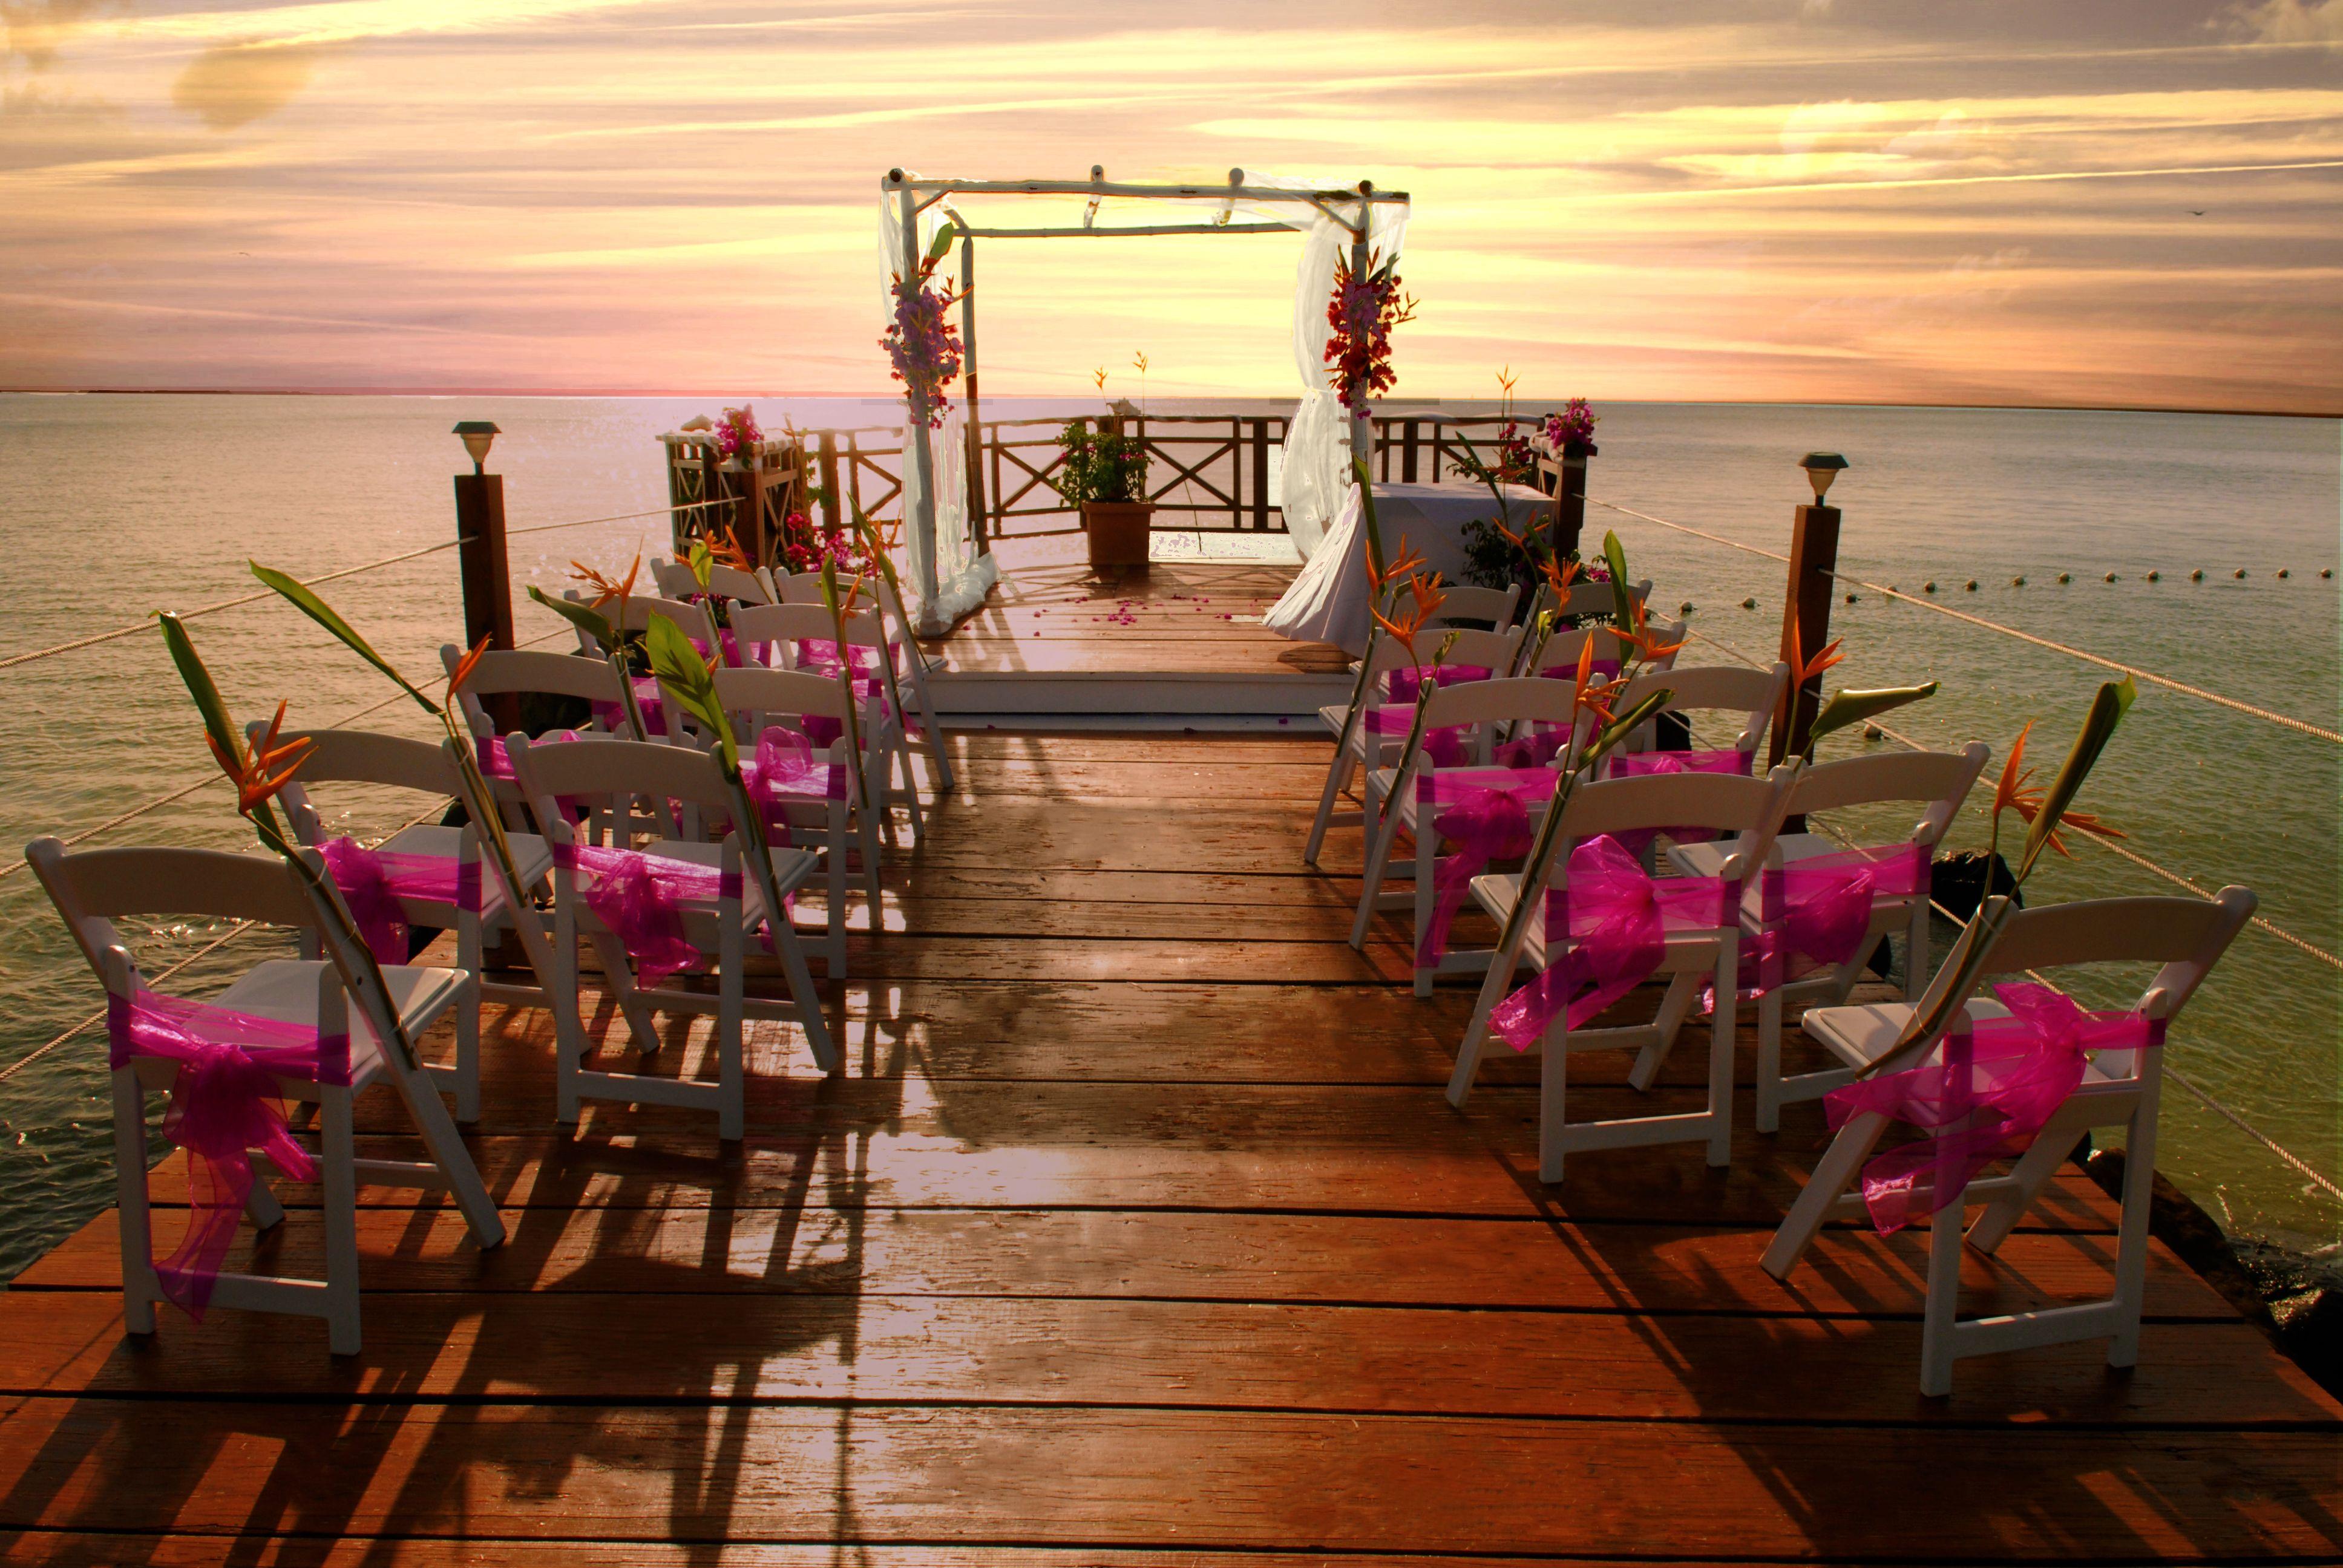 Sunset boardwalk at Calabash Cove Love, Elevated Saint